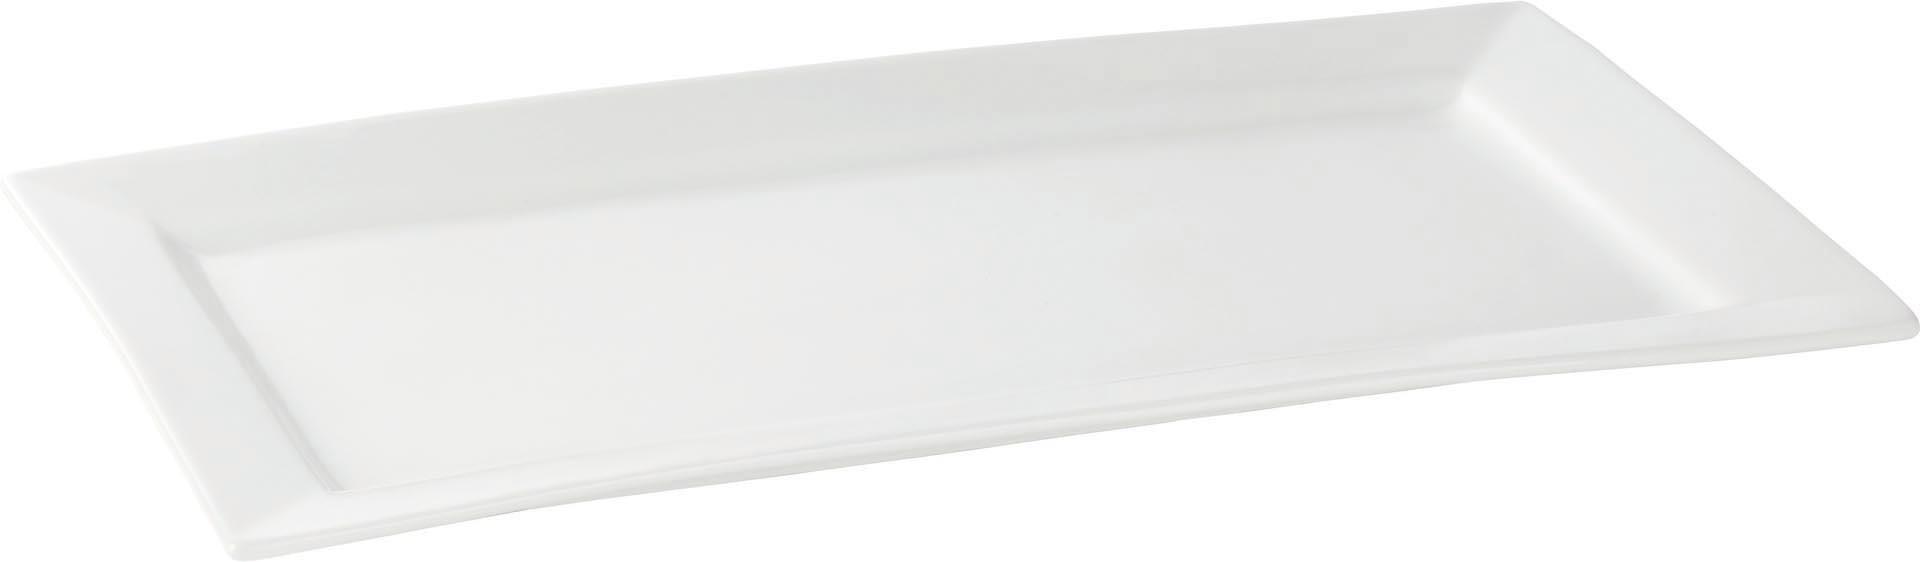 "Platte flach ""Carré"" rechteckig 45 x 27,5 cm"